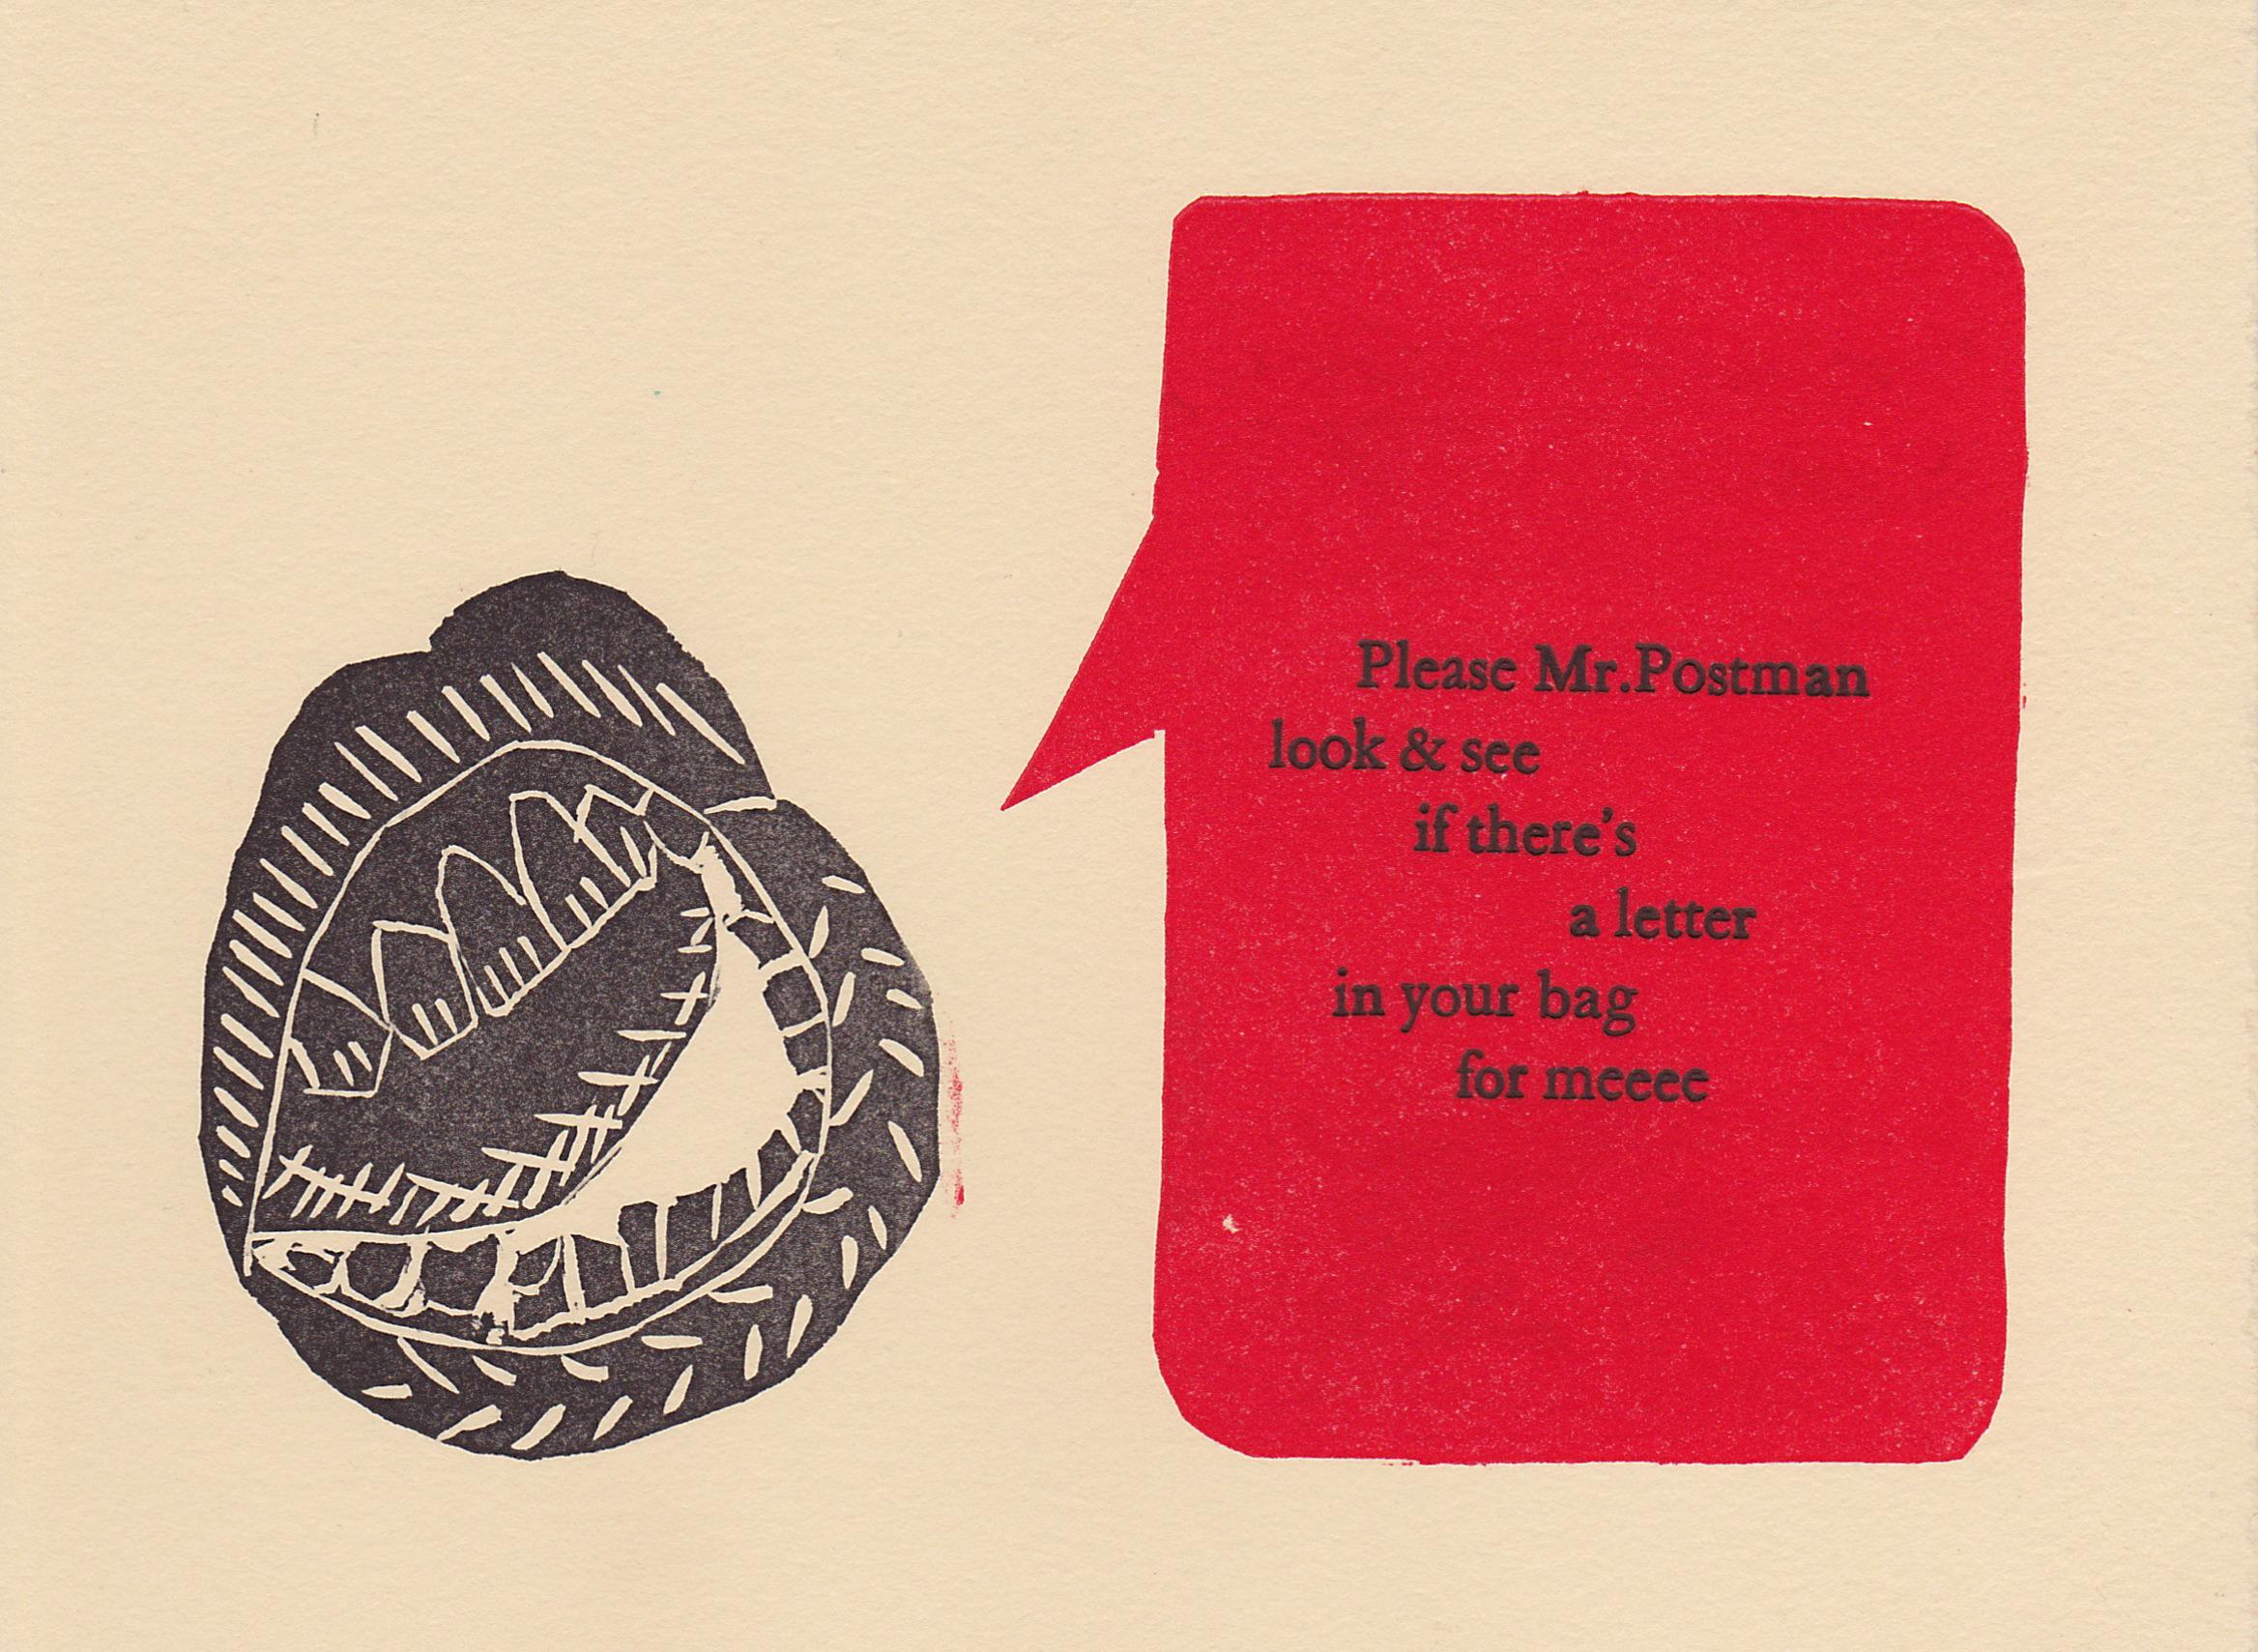 Please Mr. Postman, 2009